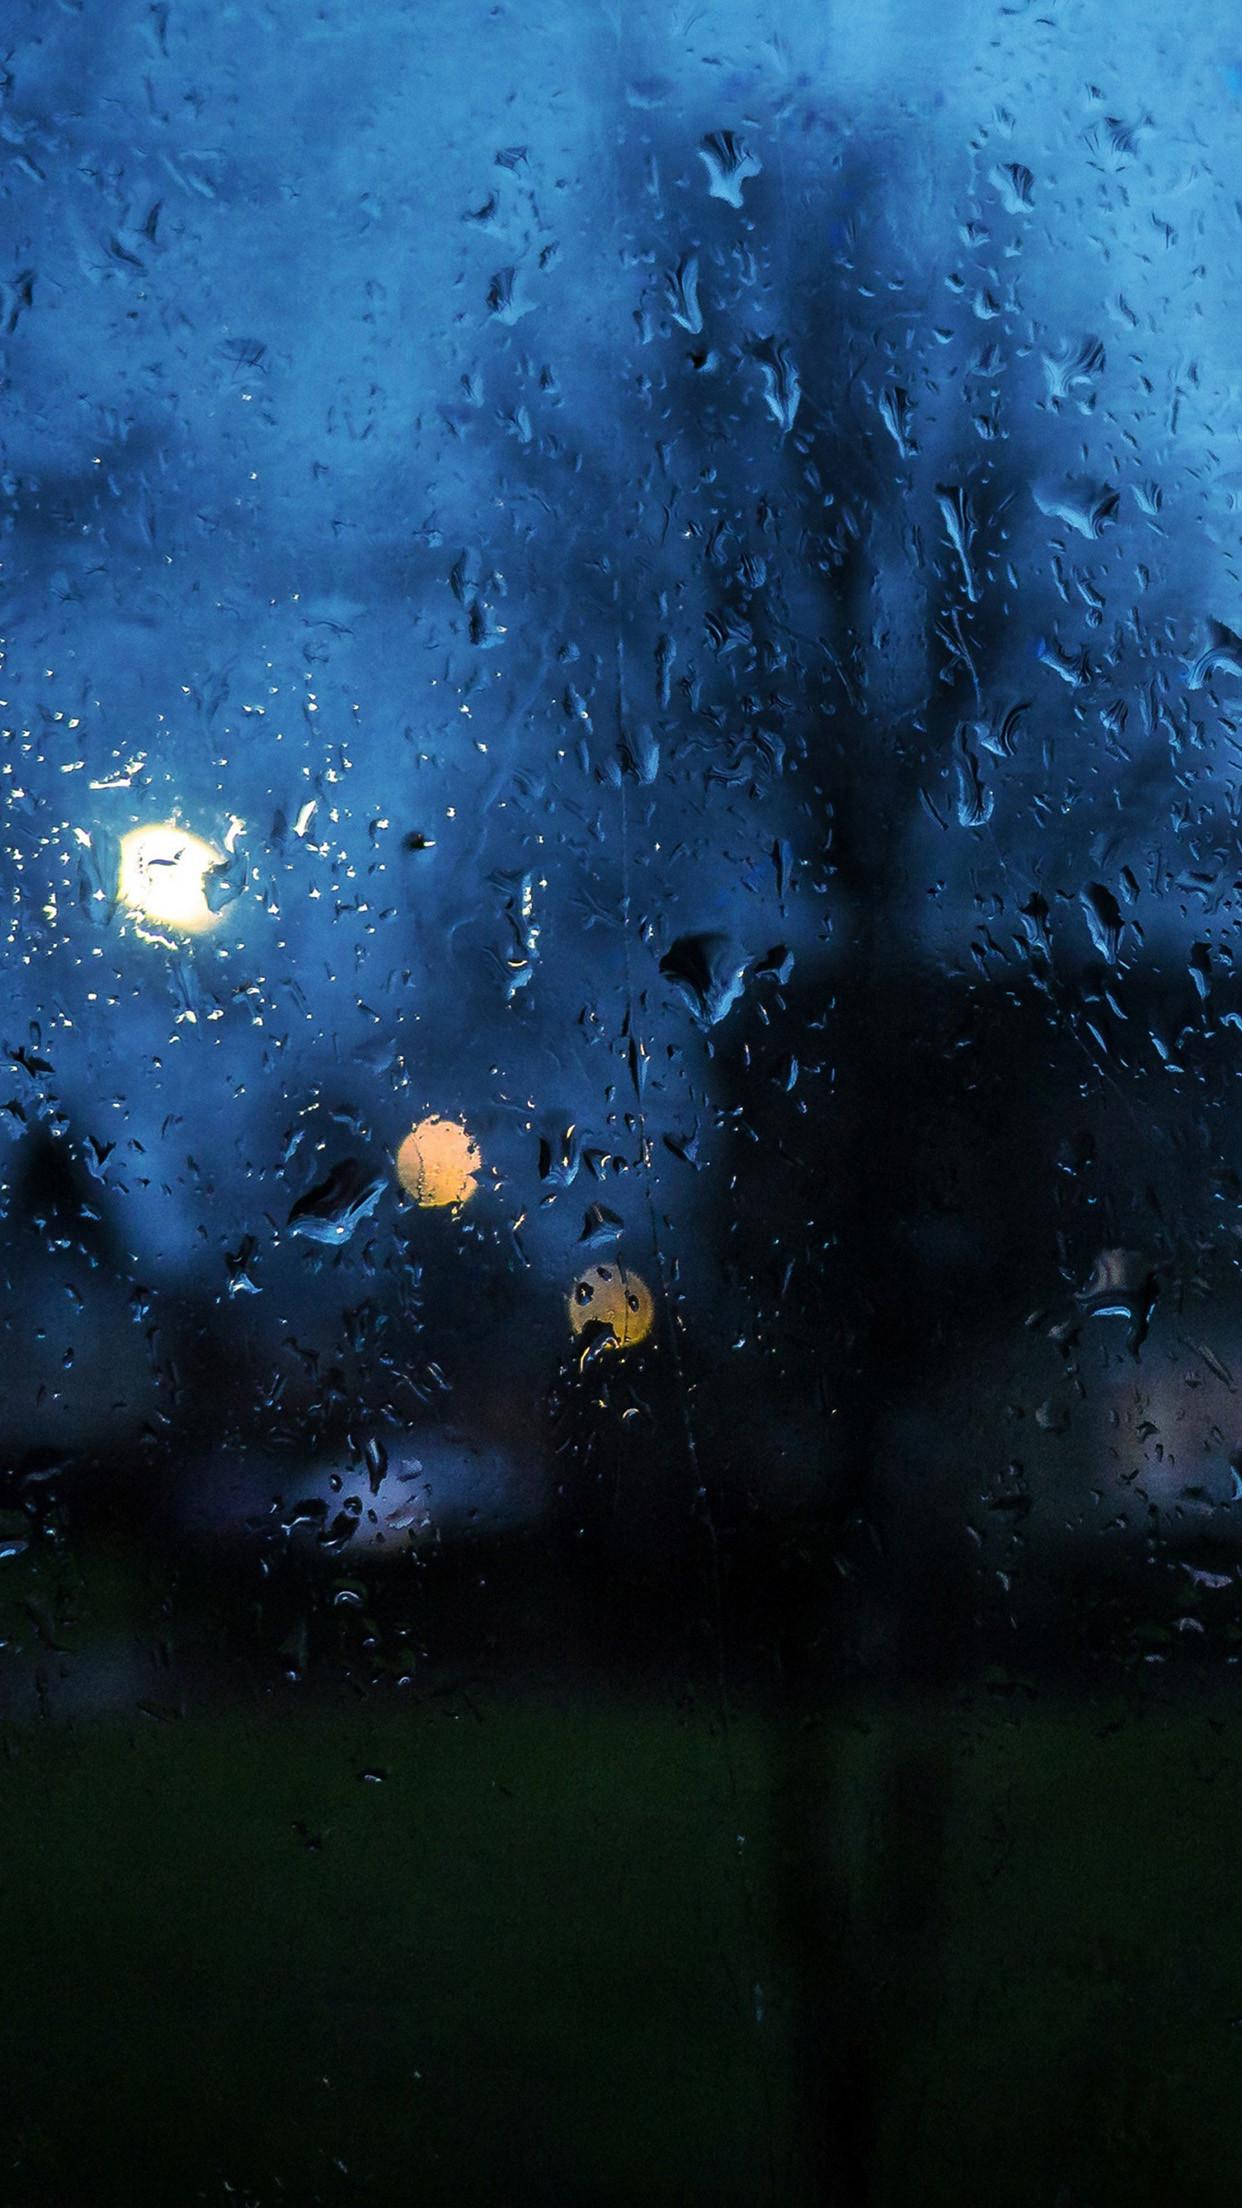 Rainy Day Window Bokeh Android Wallpaper …